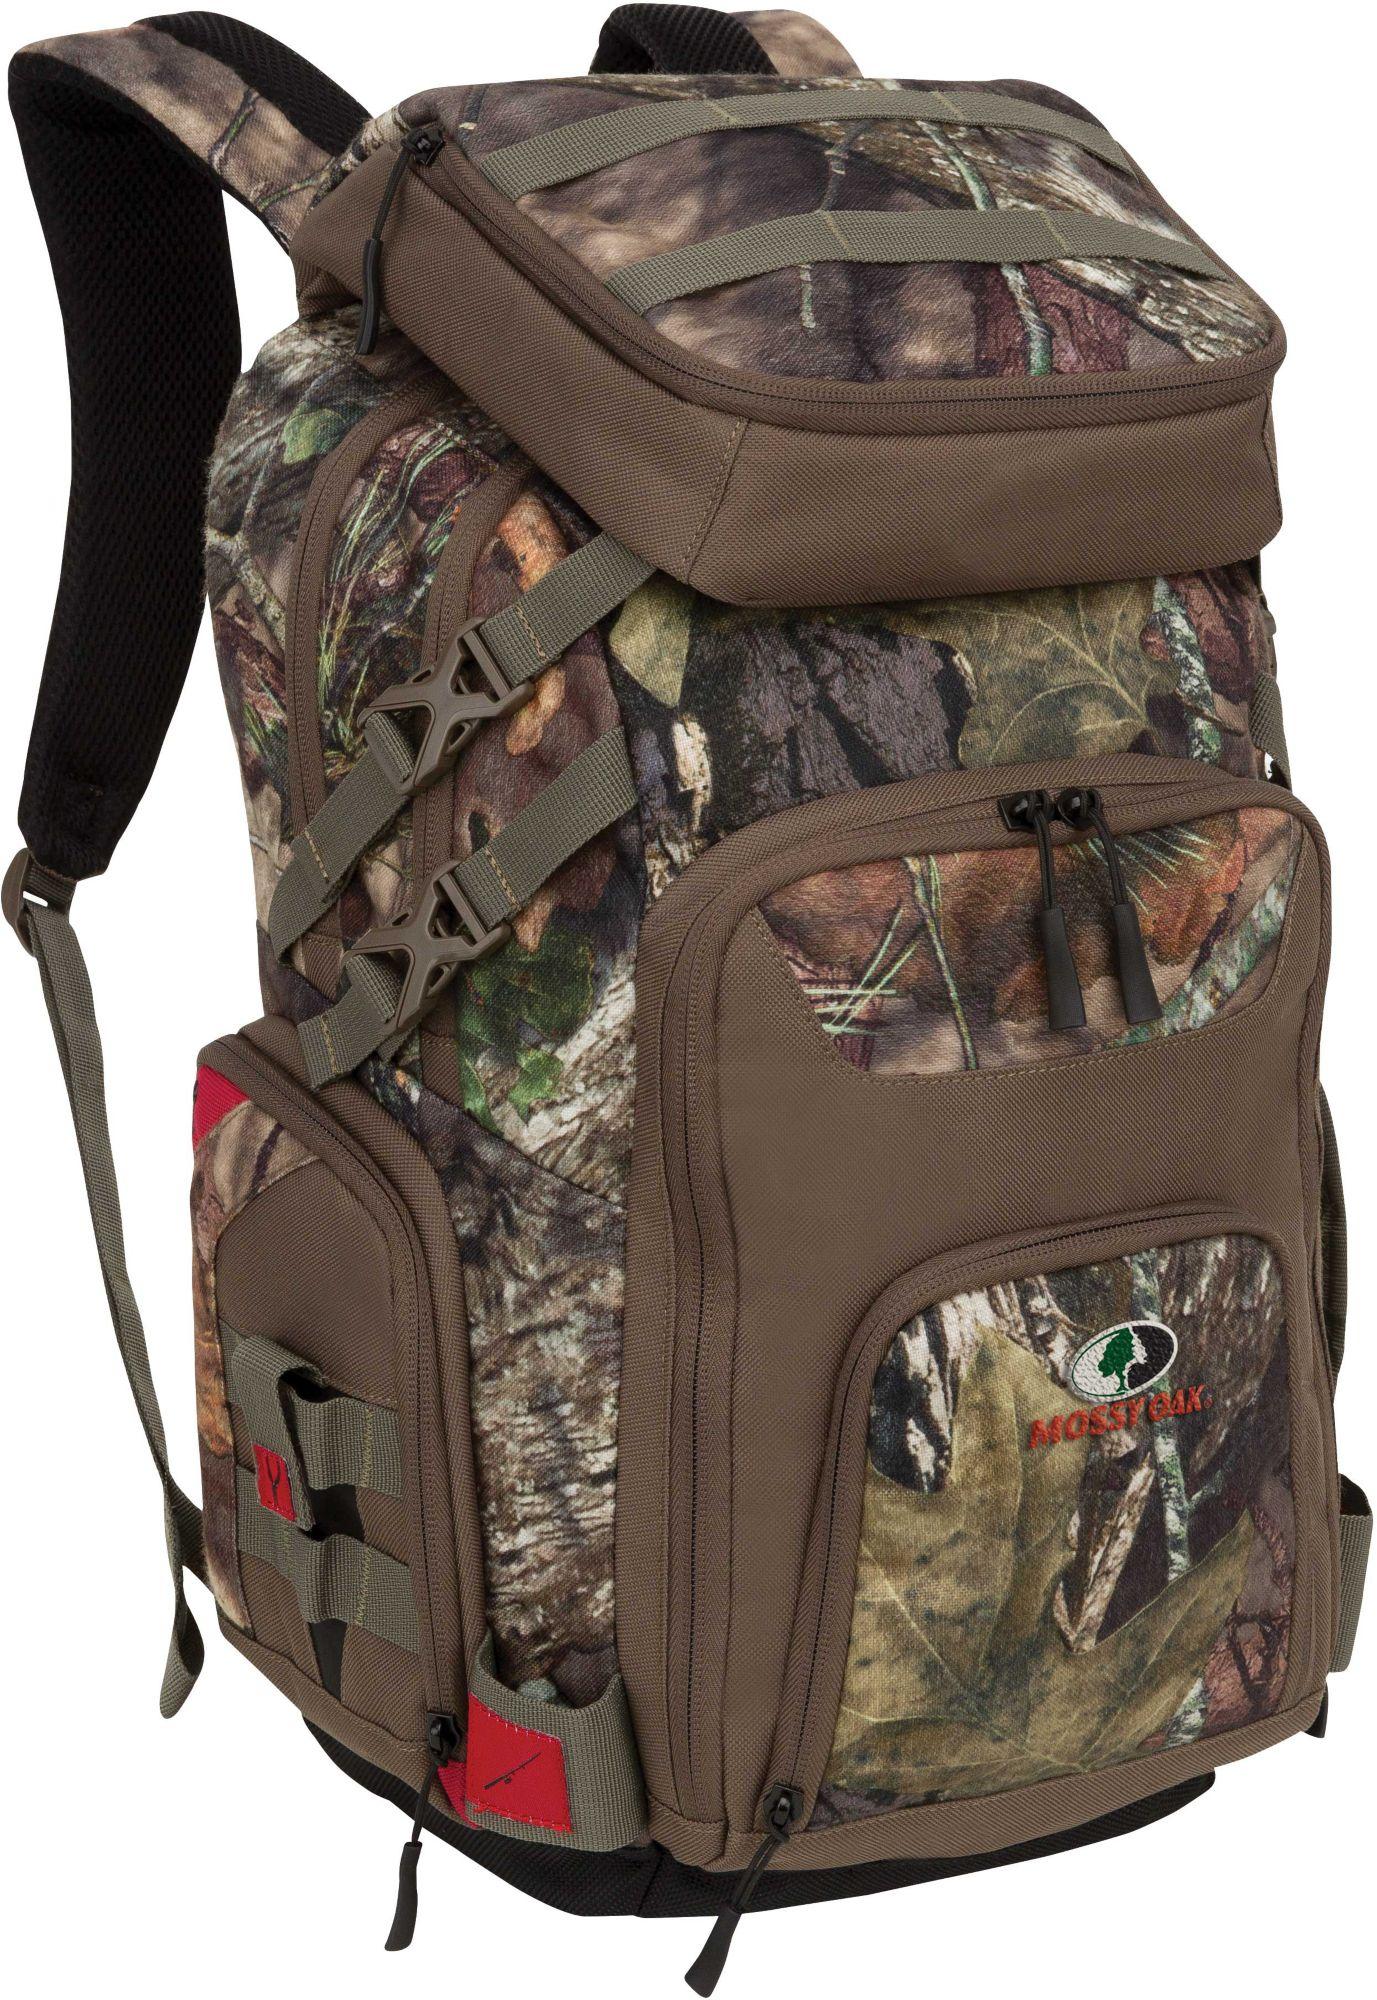 Mossy oak tackle backpack ebay for Fishing tackle backpack